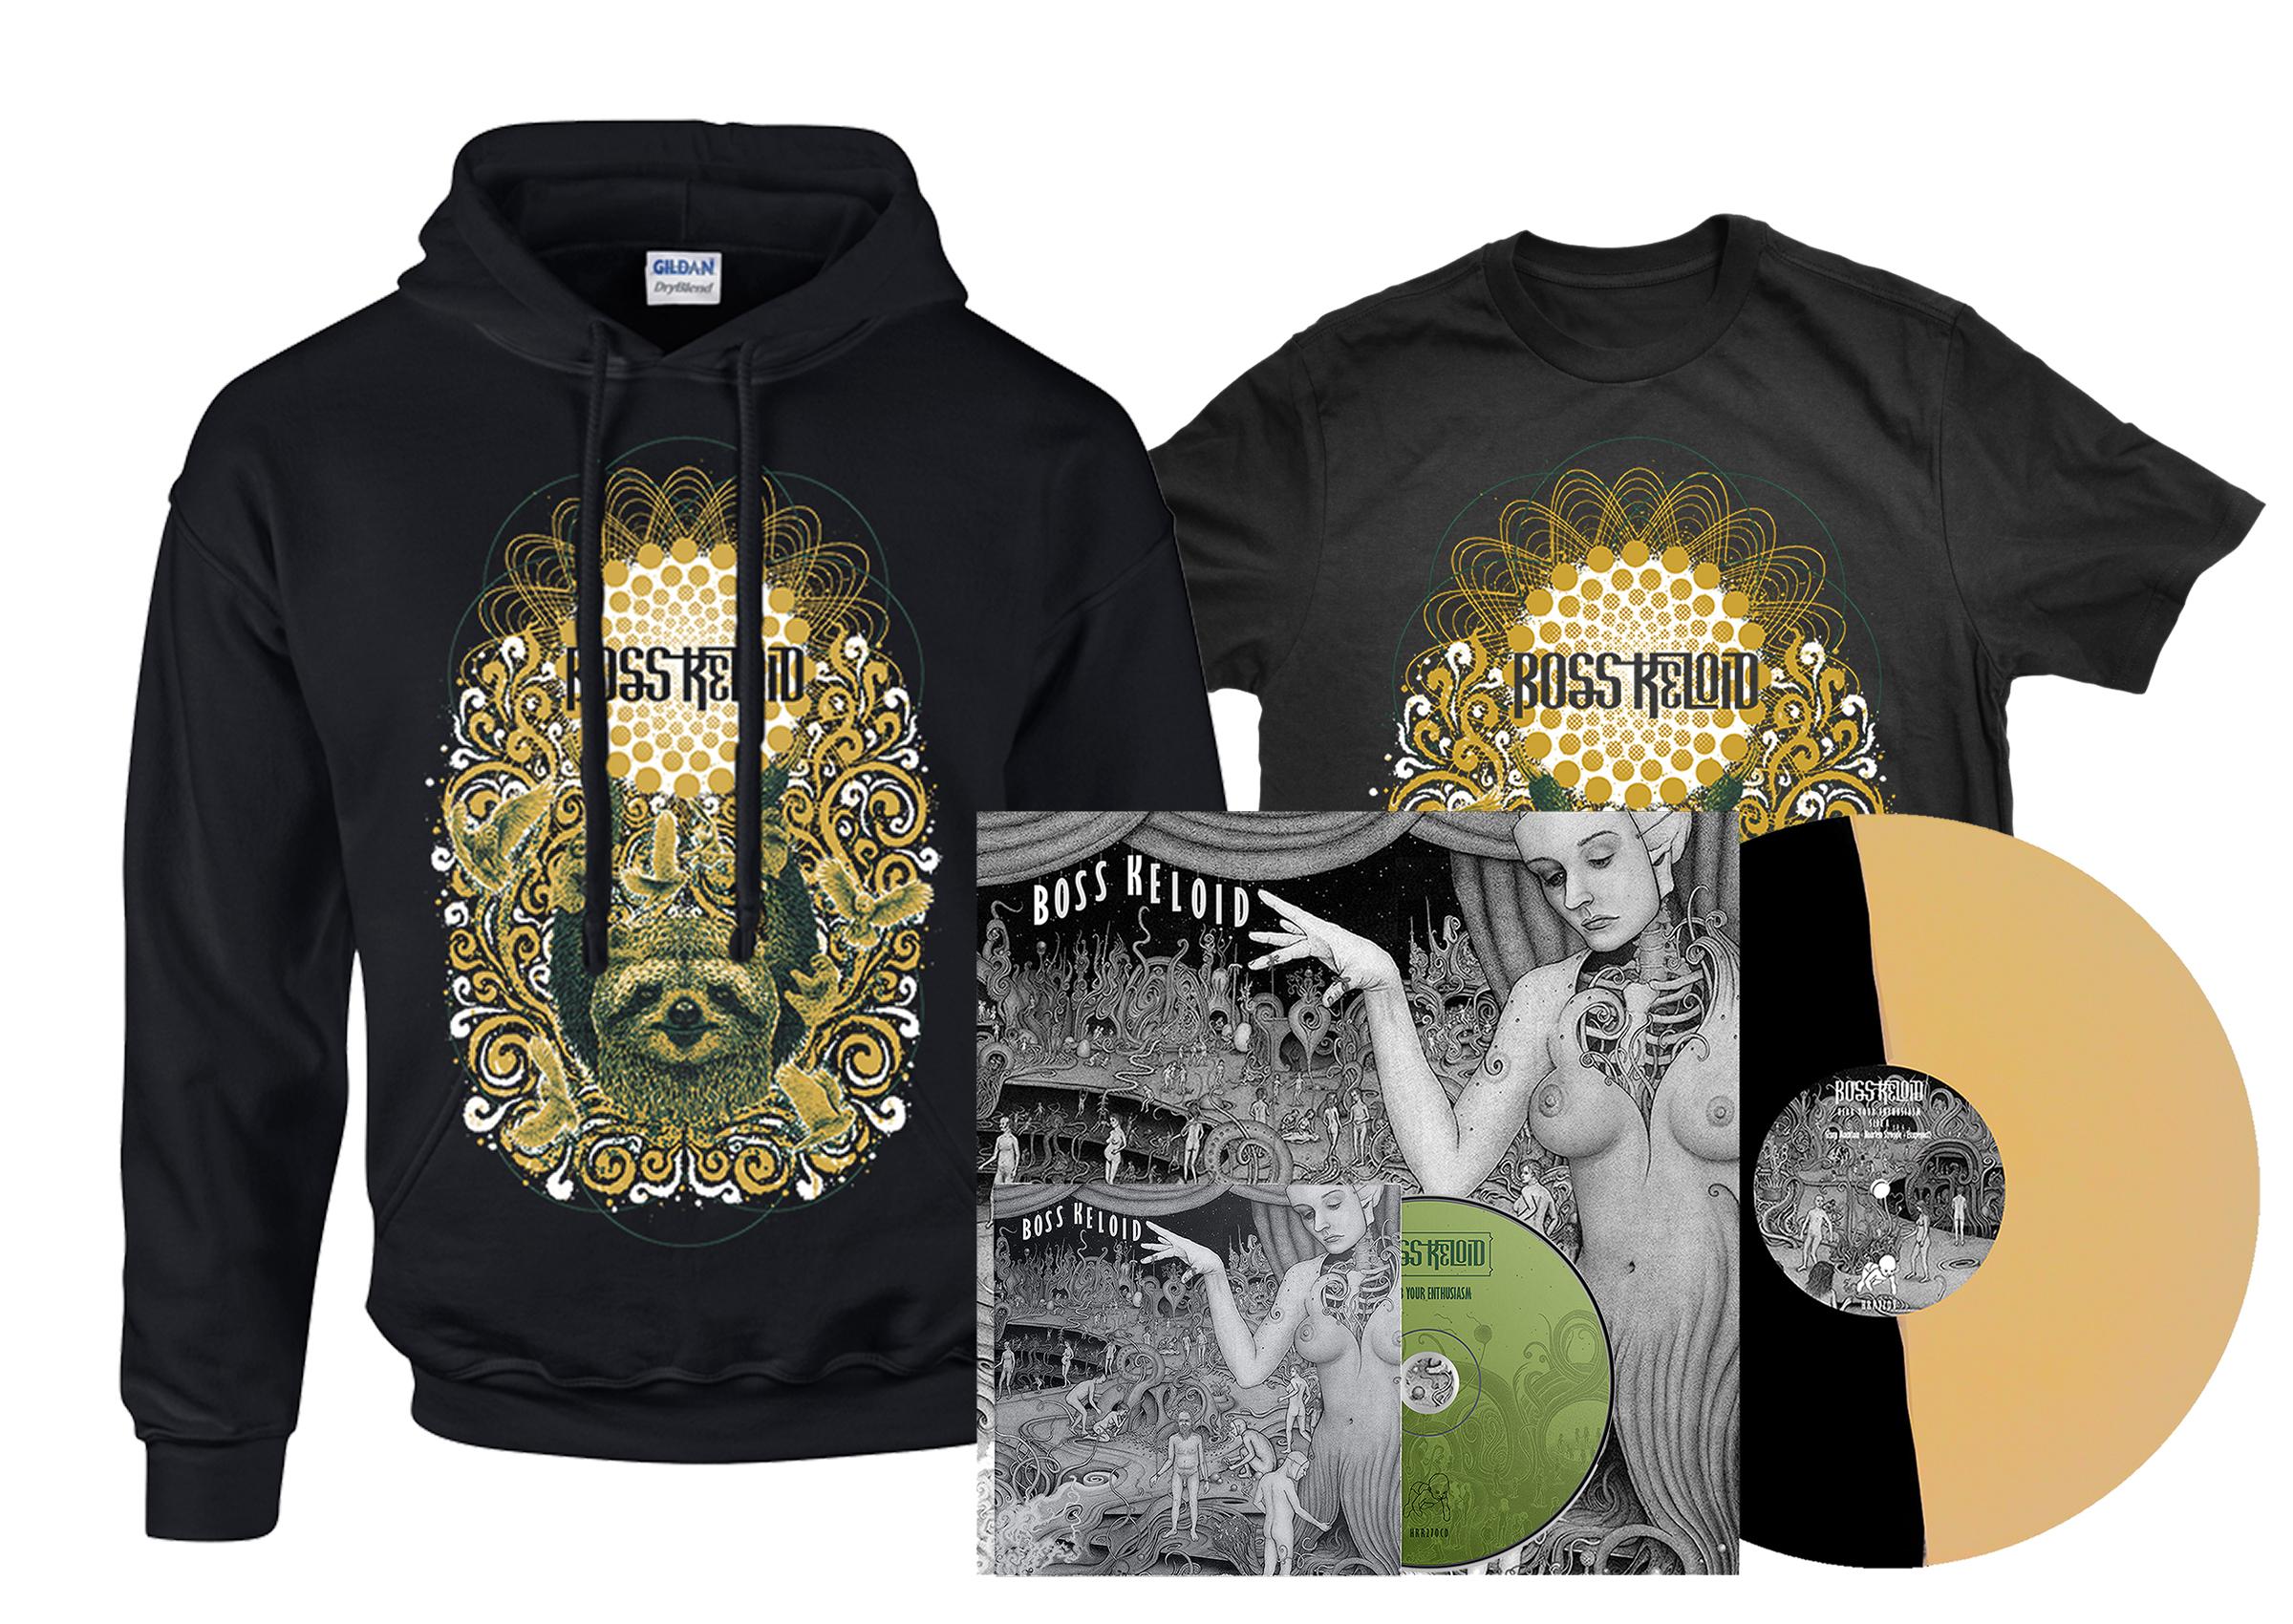 Boss Keloid - Herb Your Enthusiasm shirt + hoodie + 2xLP + CD PREORDER